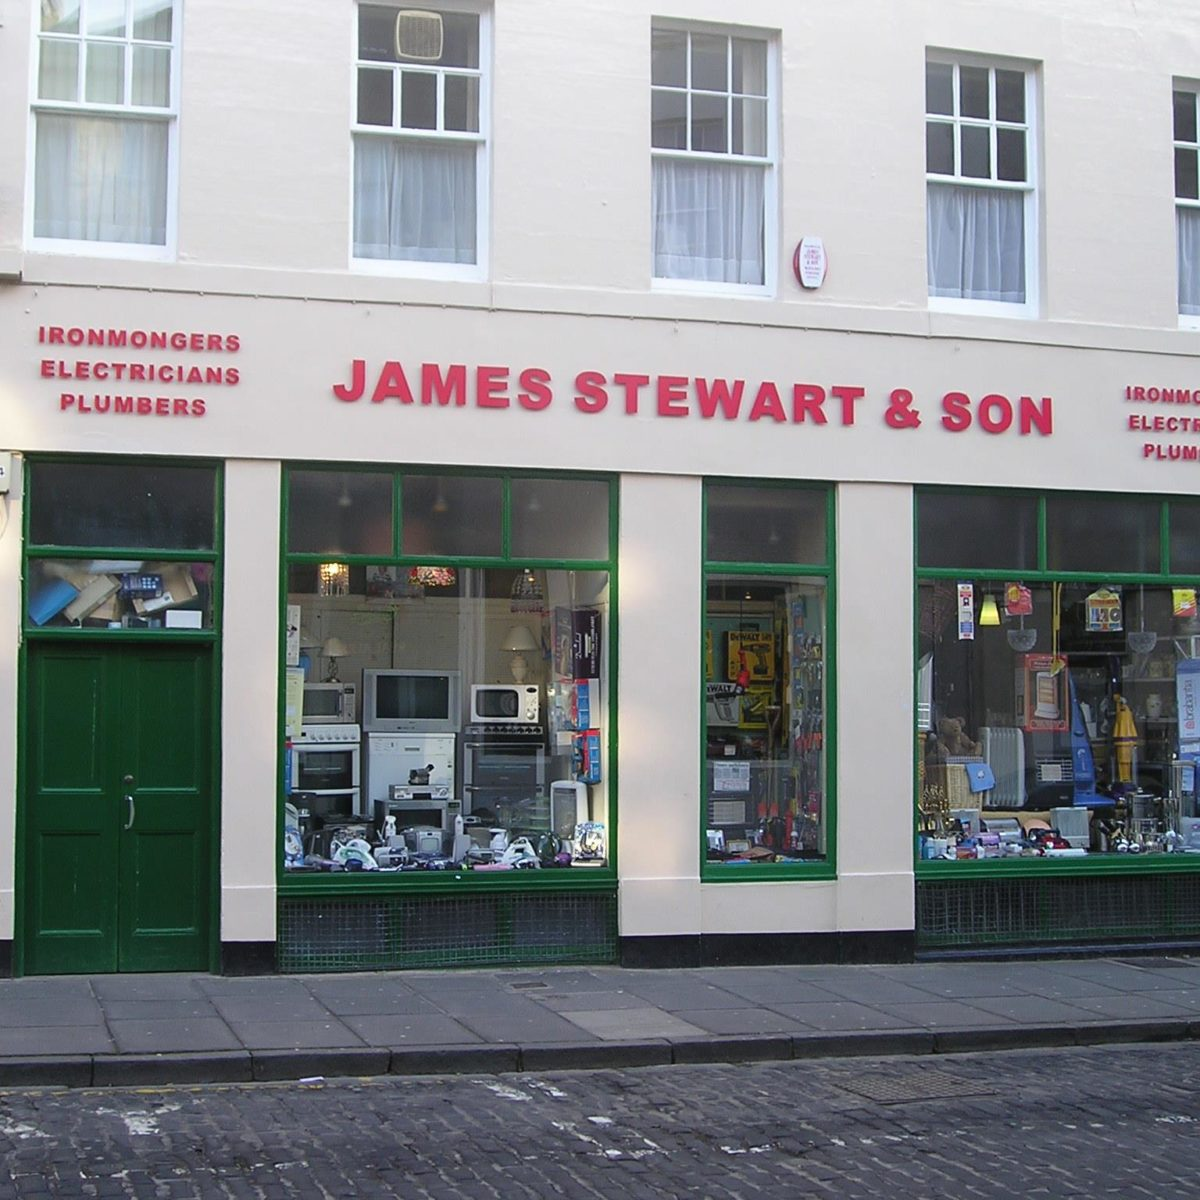 James Stewart and Son